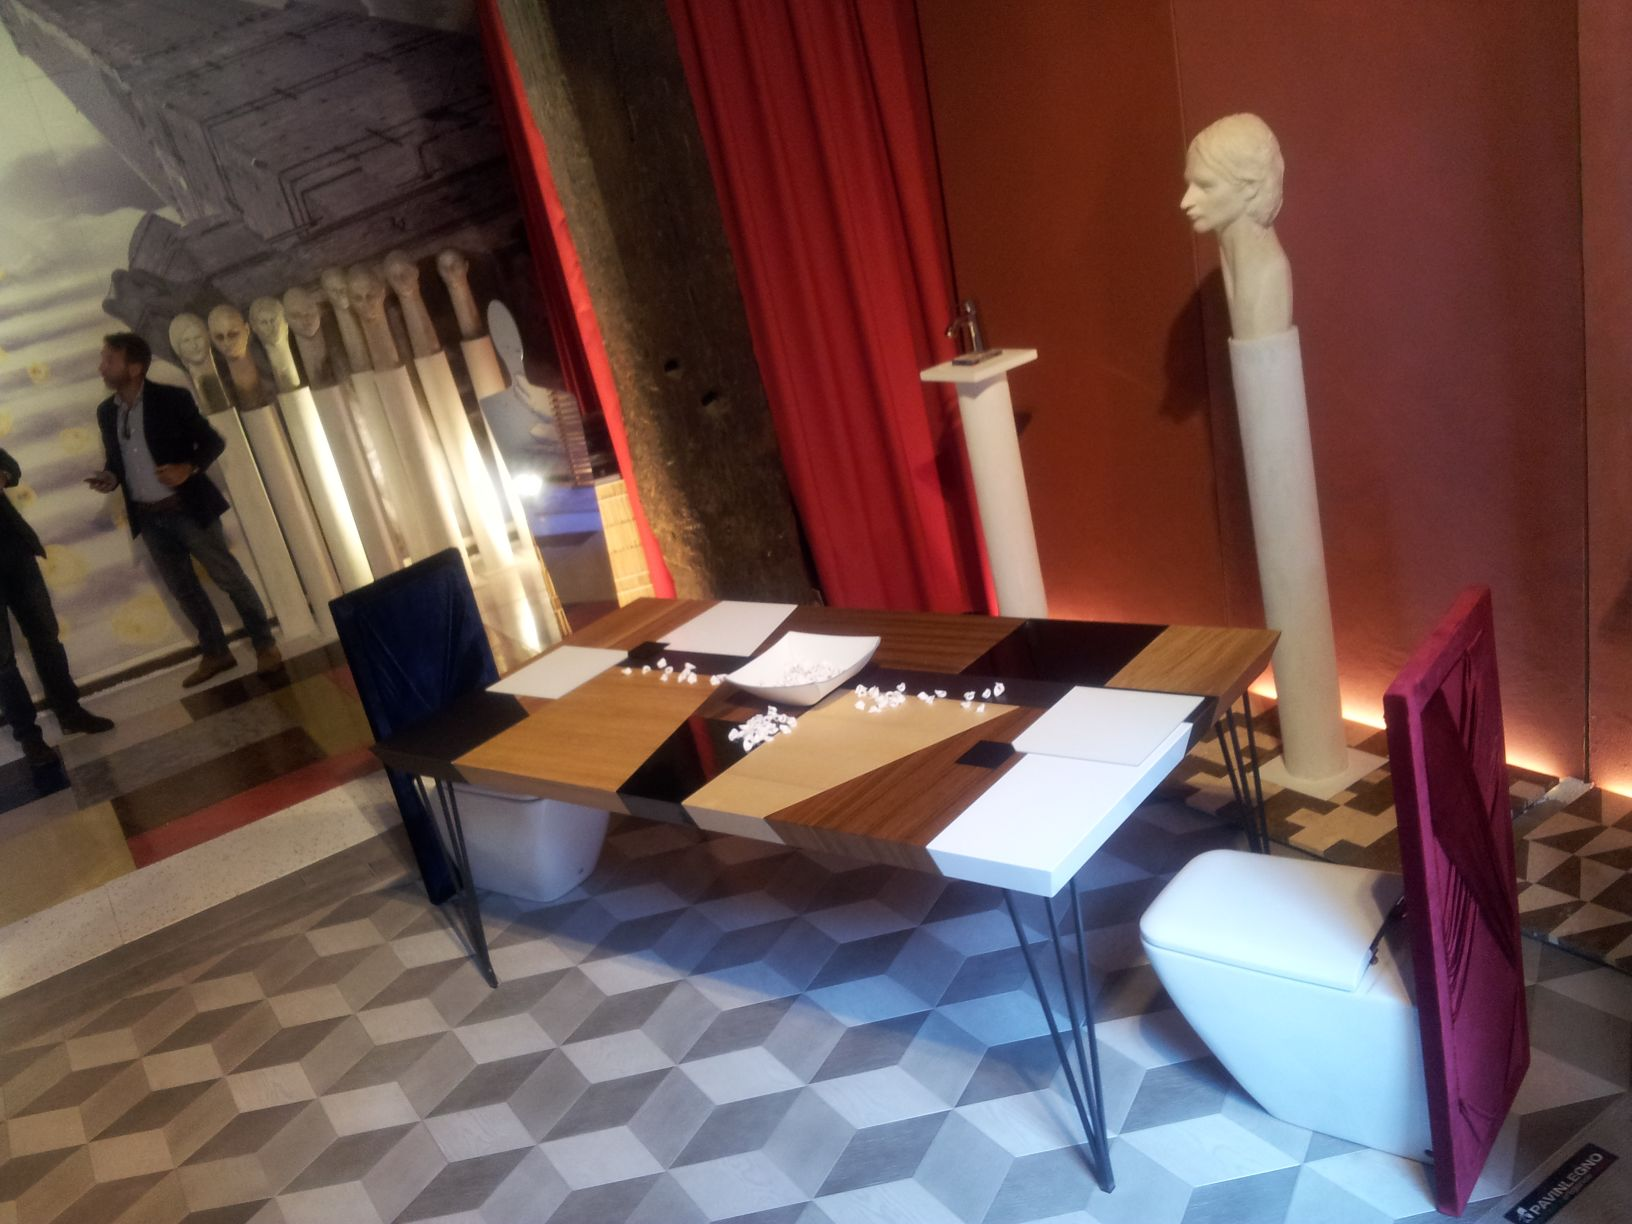 Bologna design week michele volpi studio interior design - Interior designer bologna ...